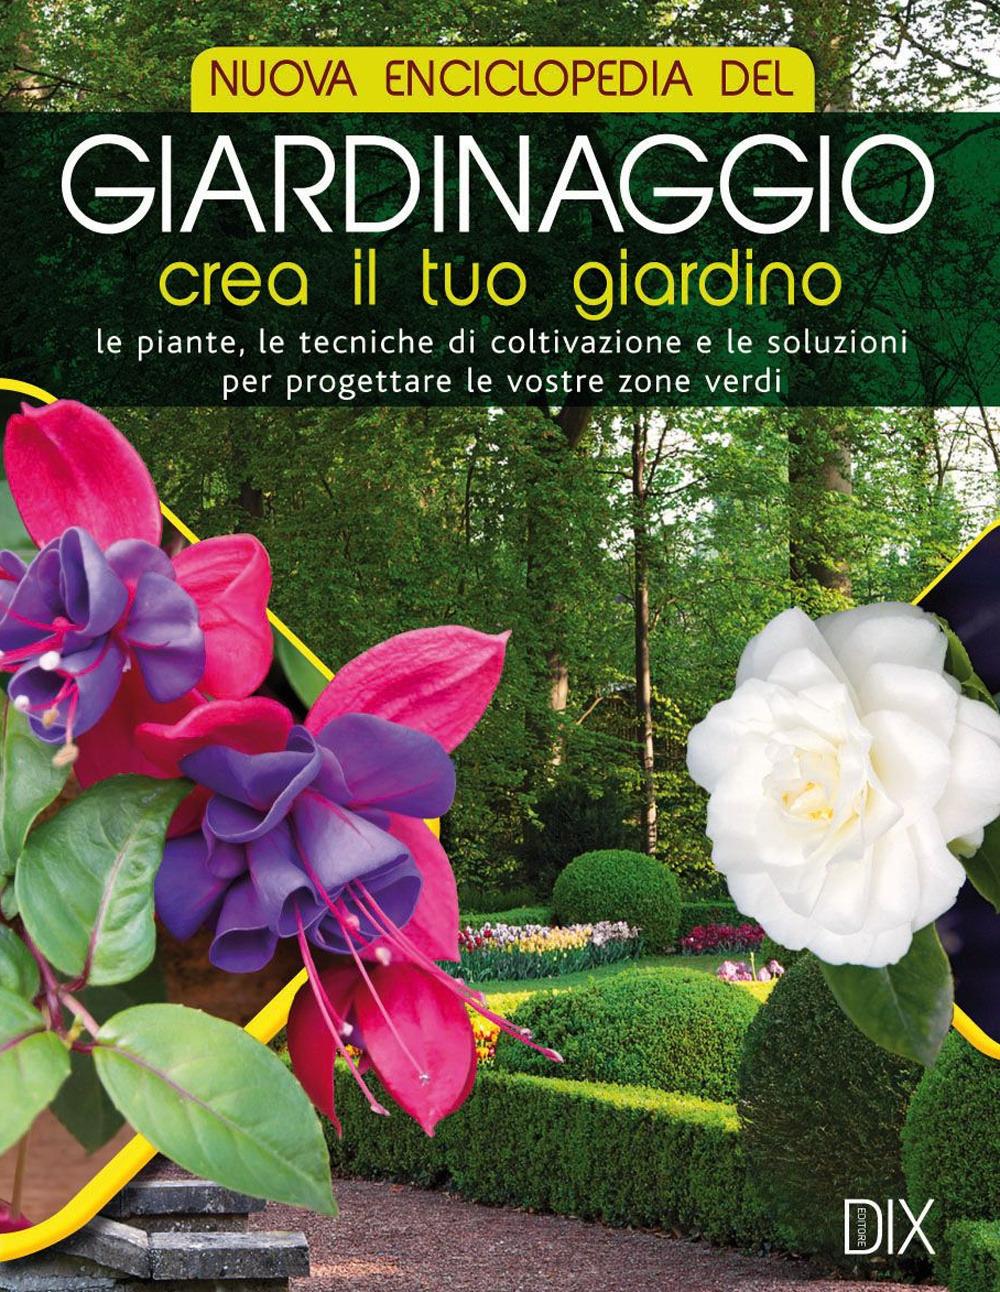 Image of Nuova enciclopedia del giardinaggio